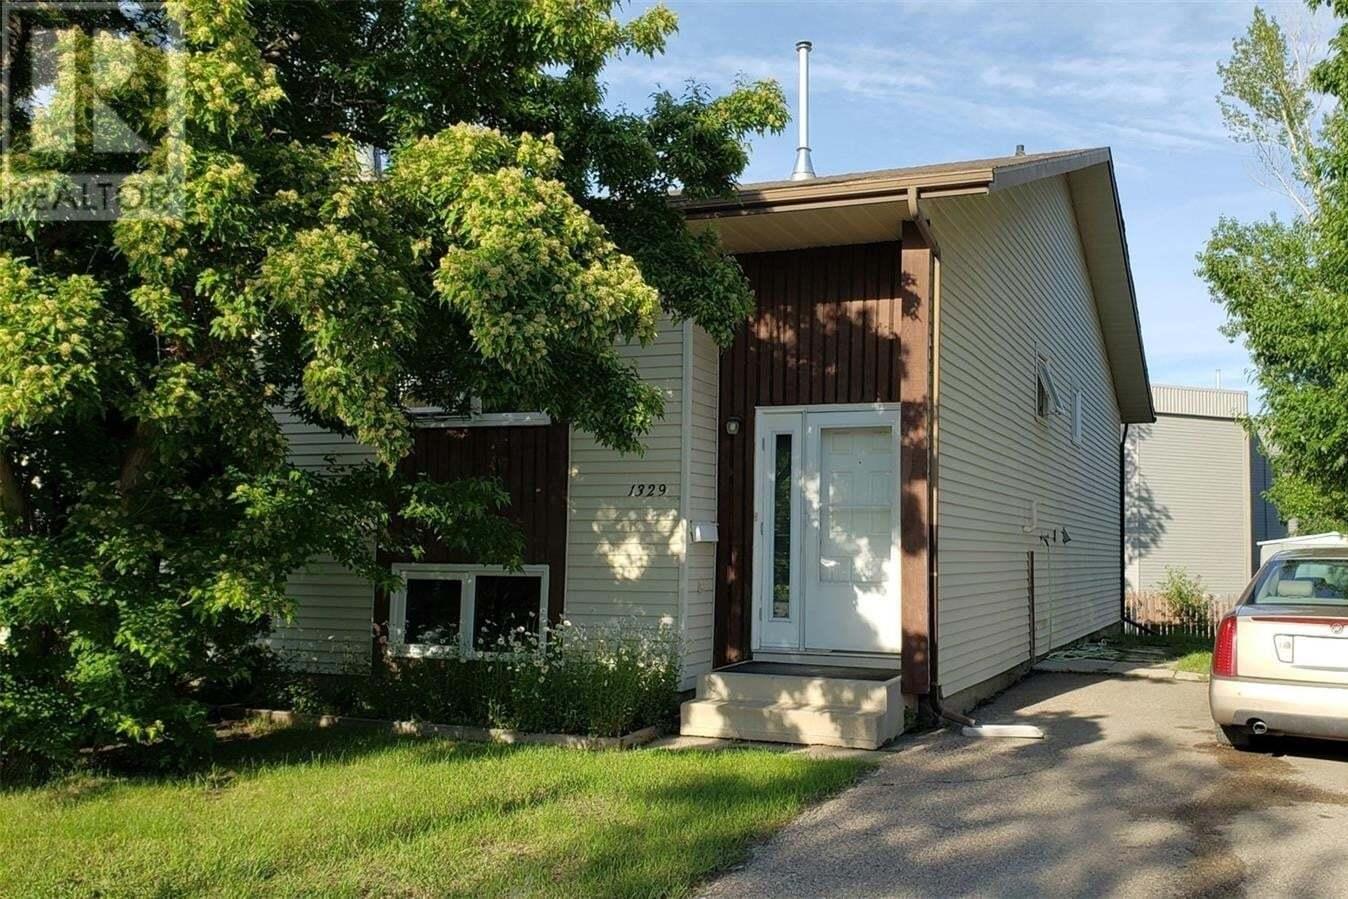 House for sale at 1329 Mckercher Dr Saskatoon Saskatchewan - MLS: SK815538